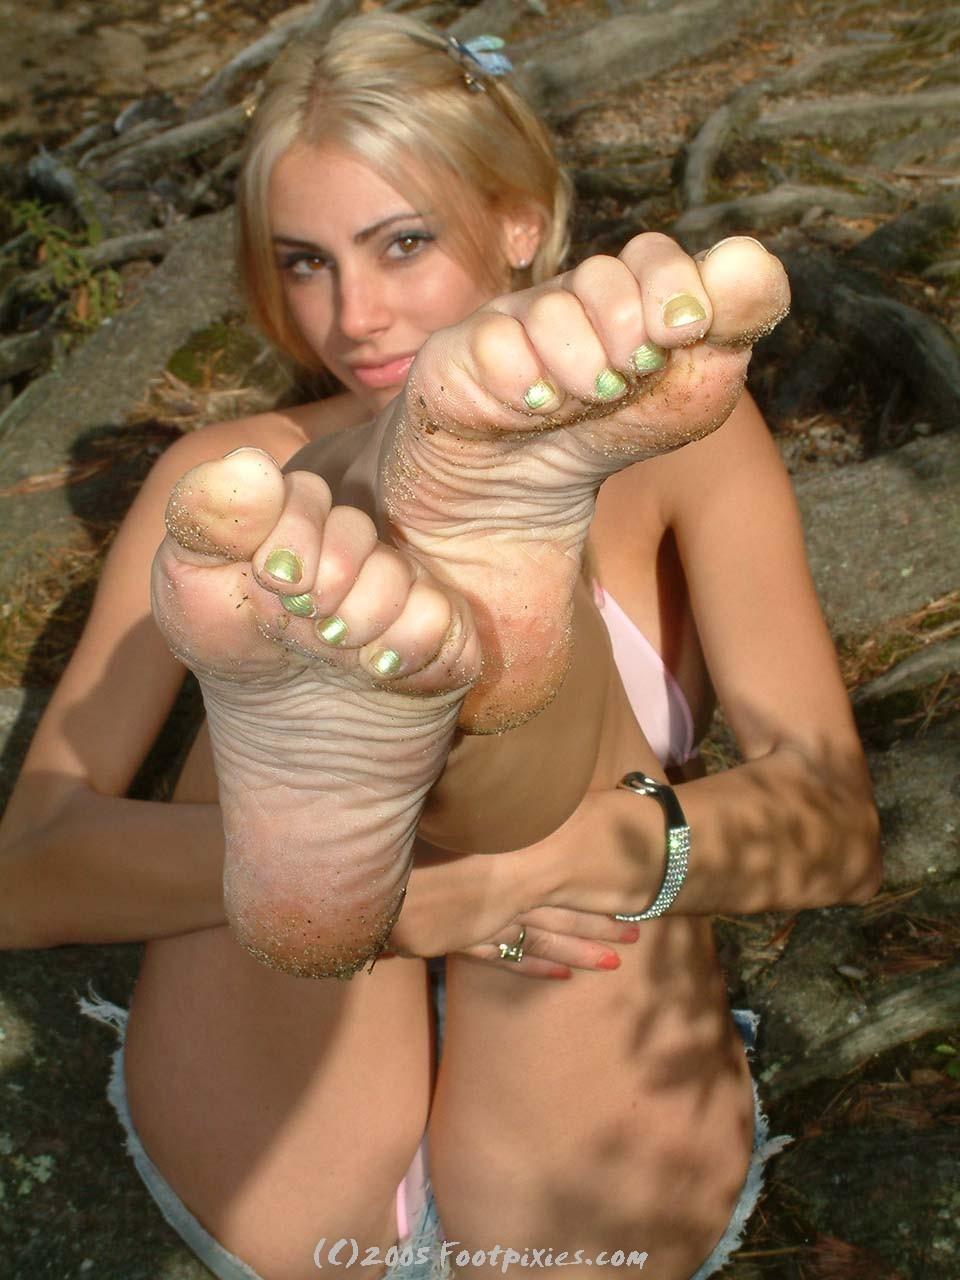 Tubo de fetichismo de pies de Brasil